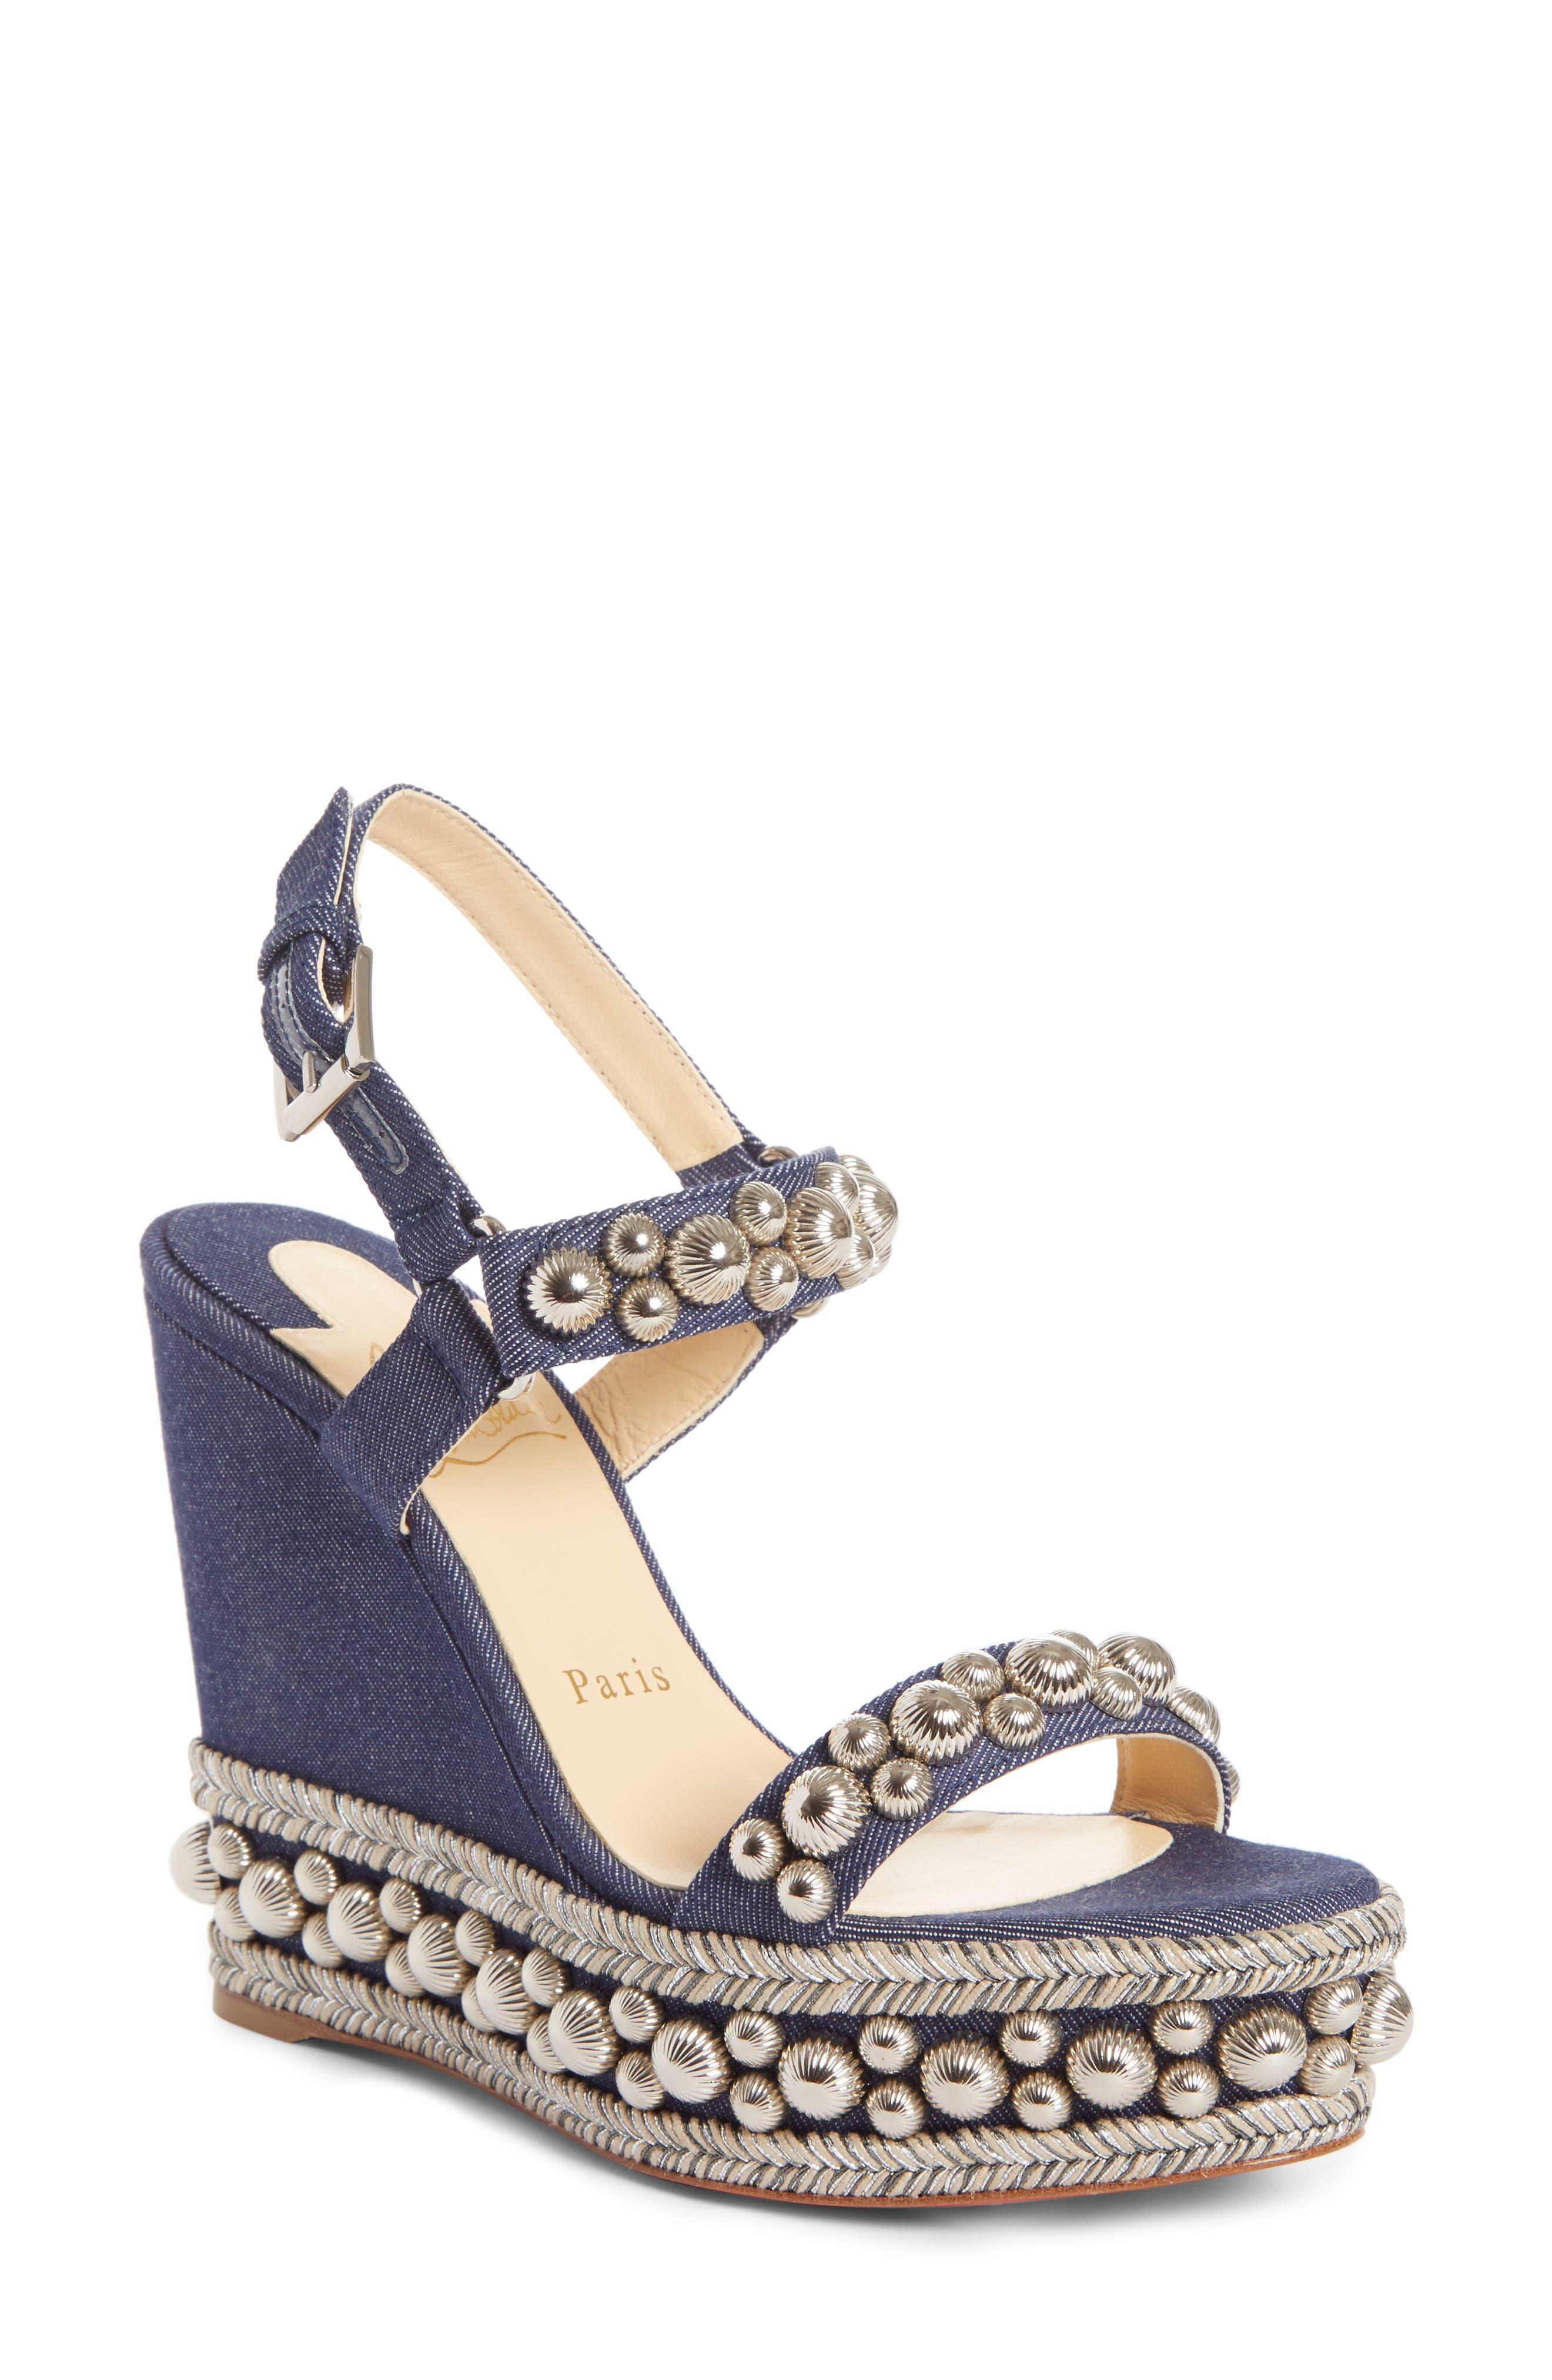 Rondaclou Studded Wedge Sandal,                             Main thumbnail 1, color,                             Denim Blue